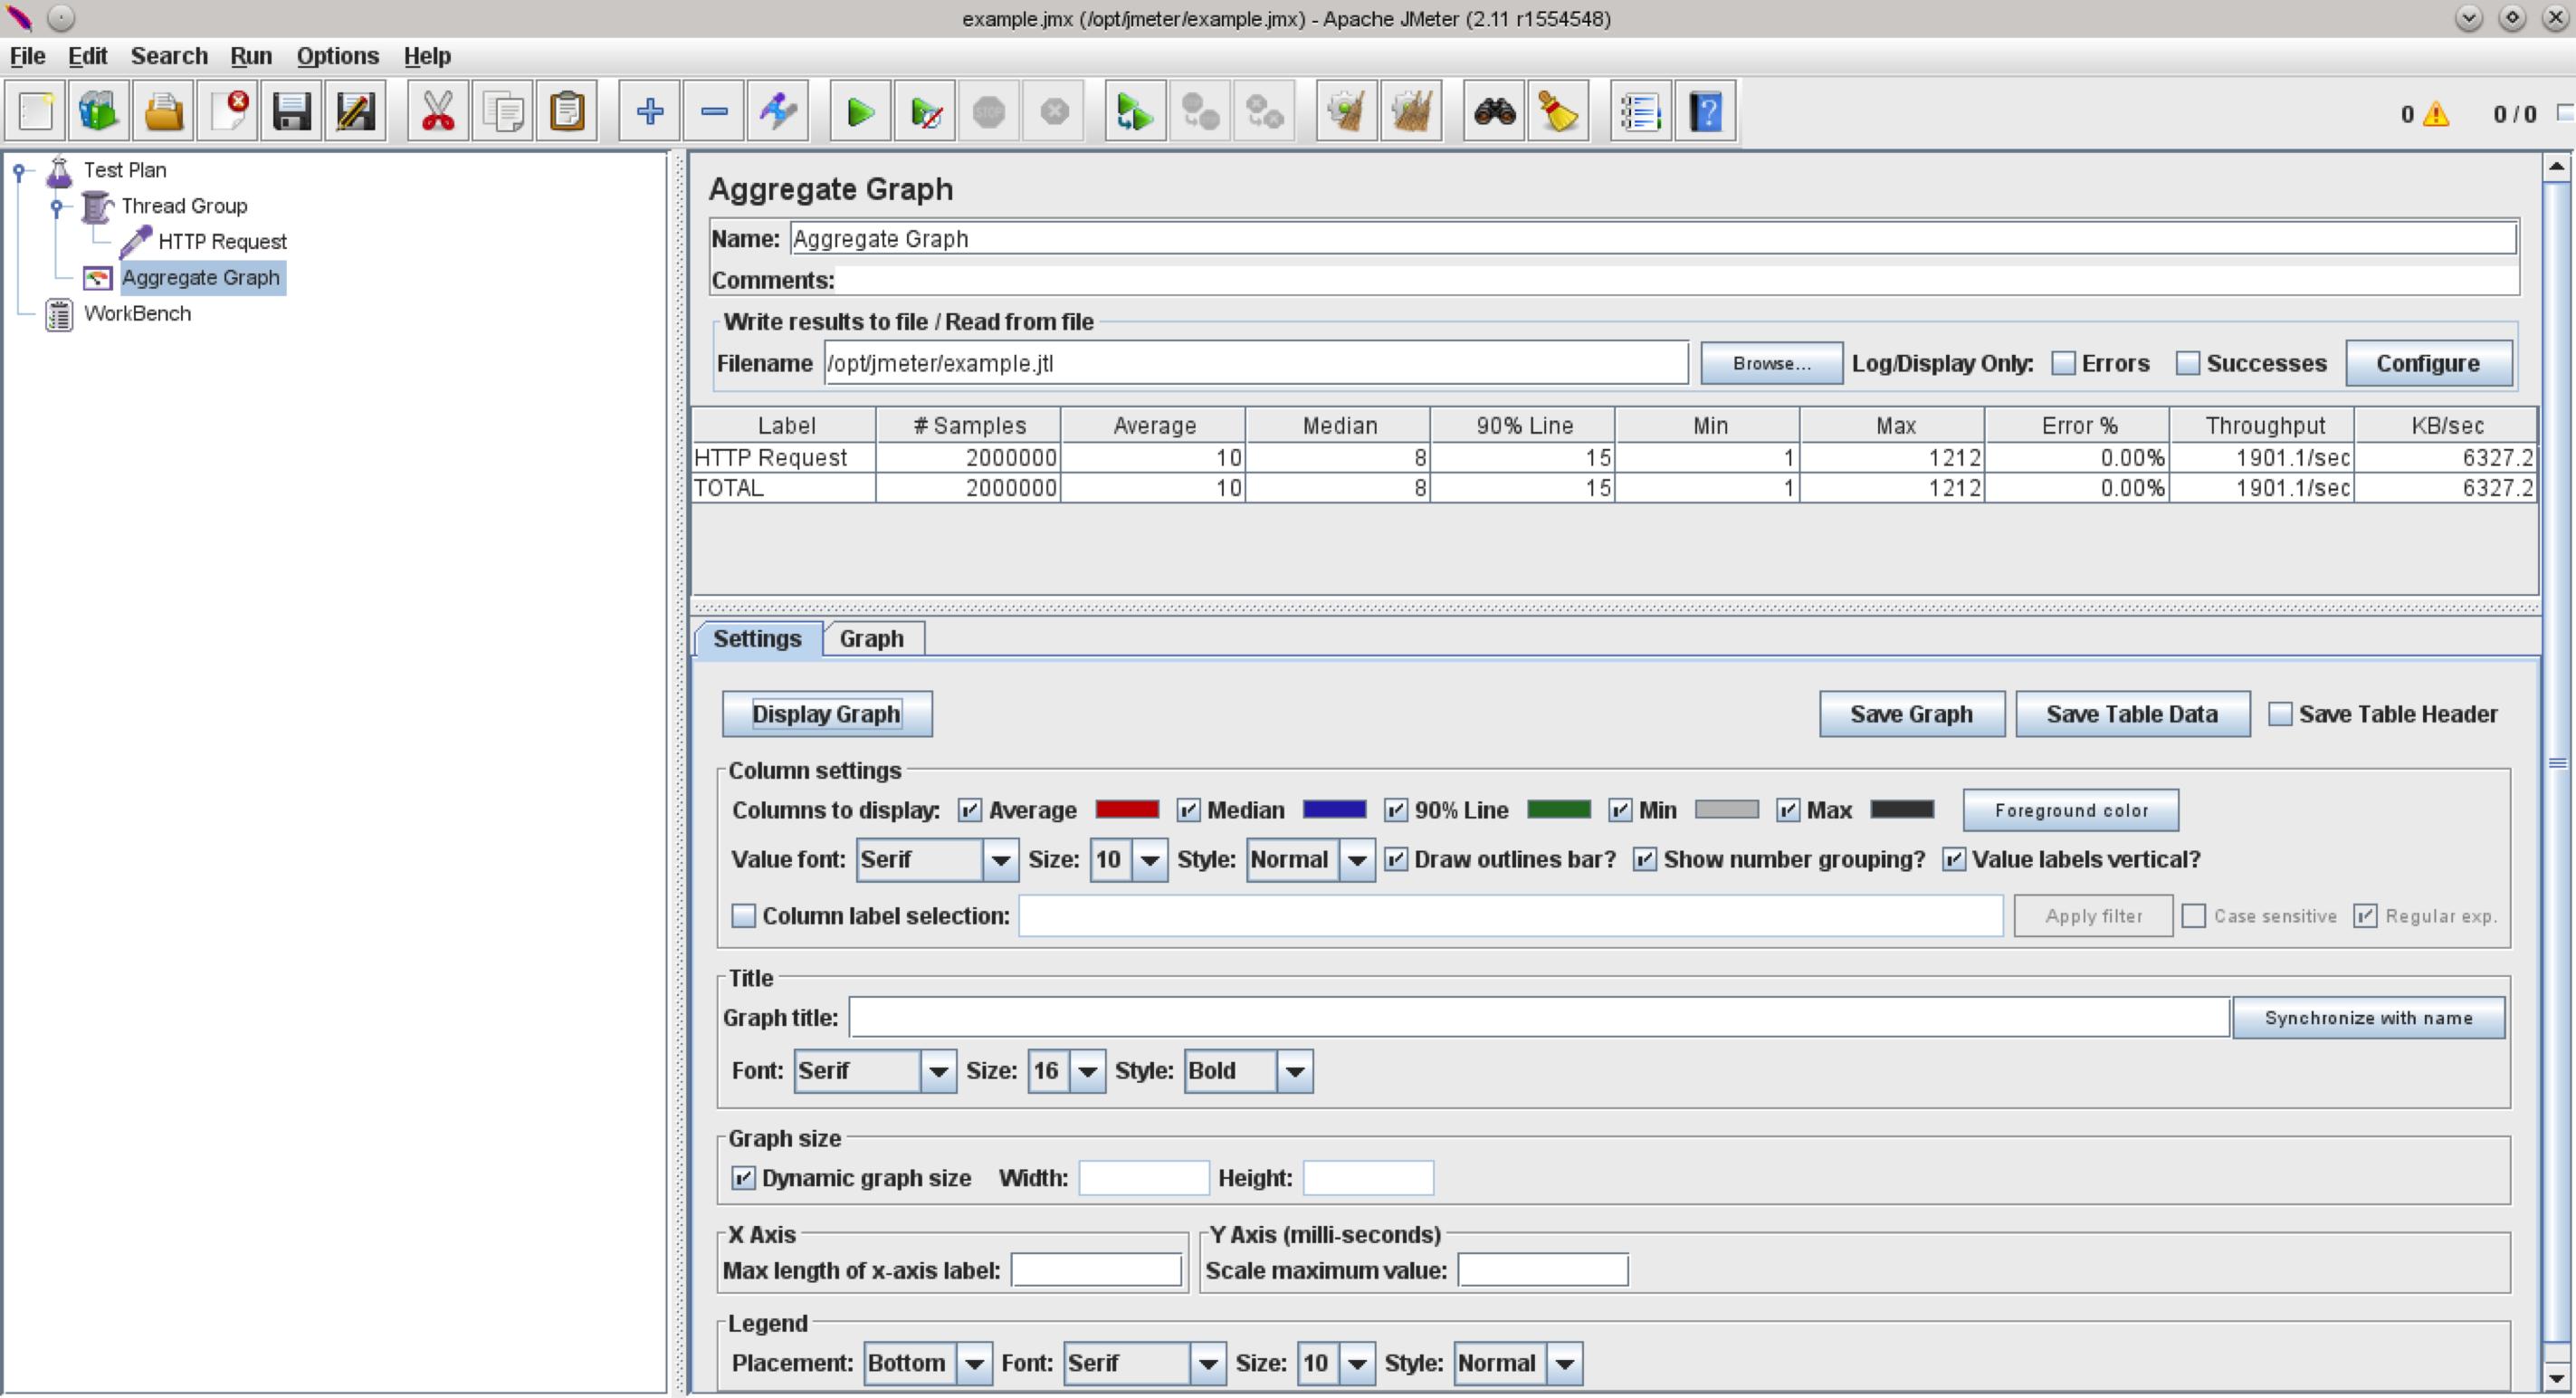 load-testing-tool-apache-jmeter